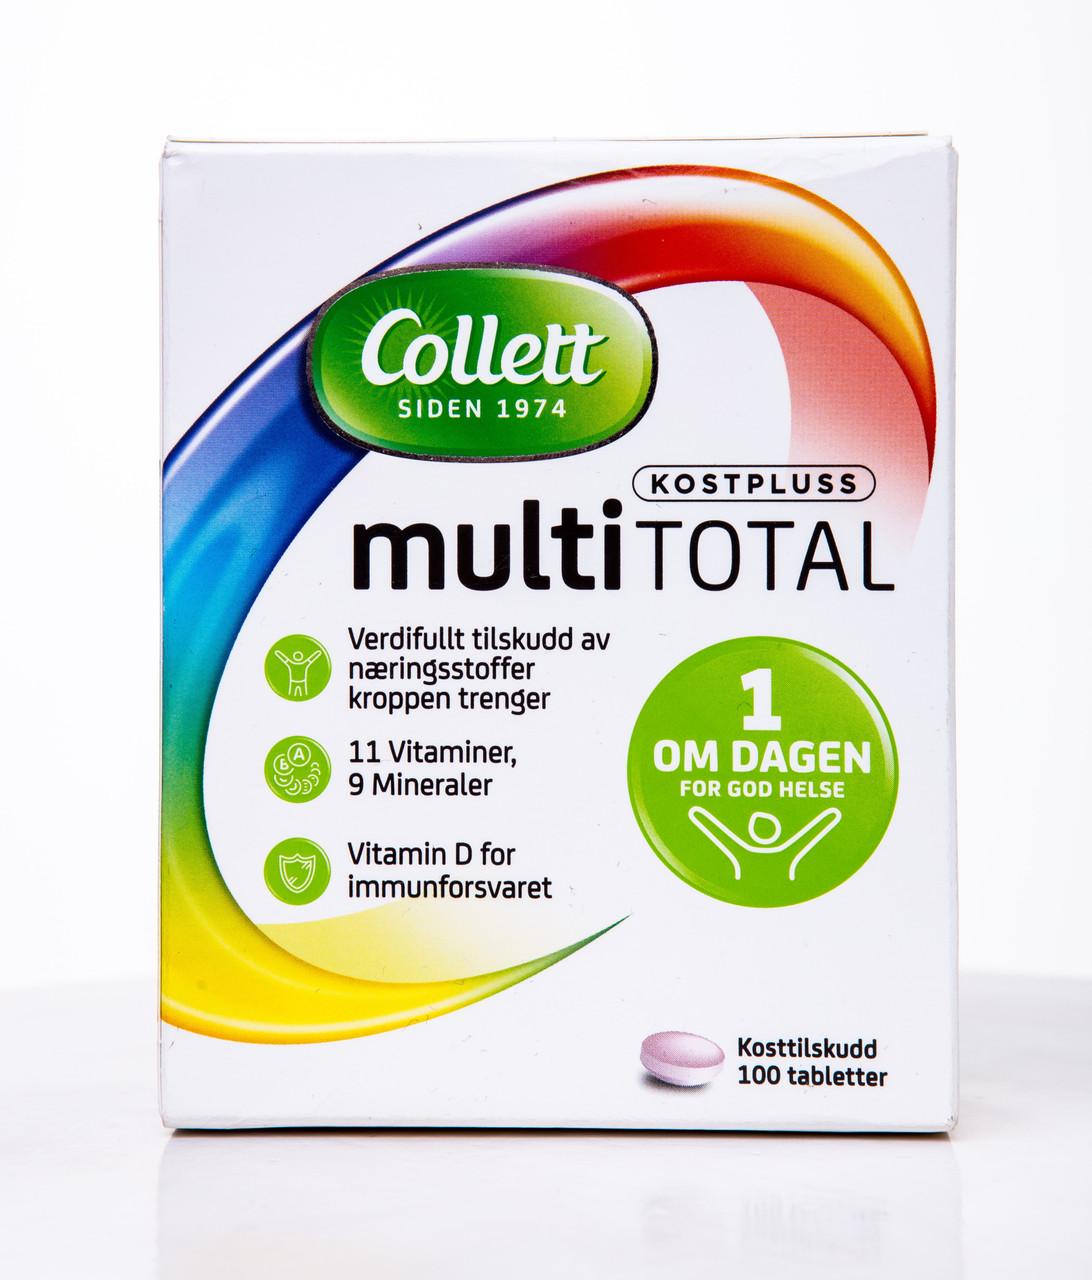 Витамины и минералы комплекс Collett Multi Total 100 таблеток Норвегия